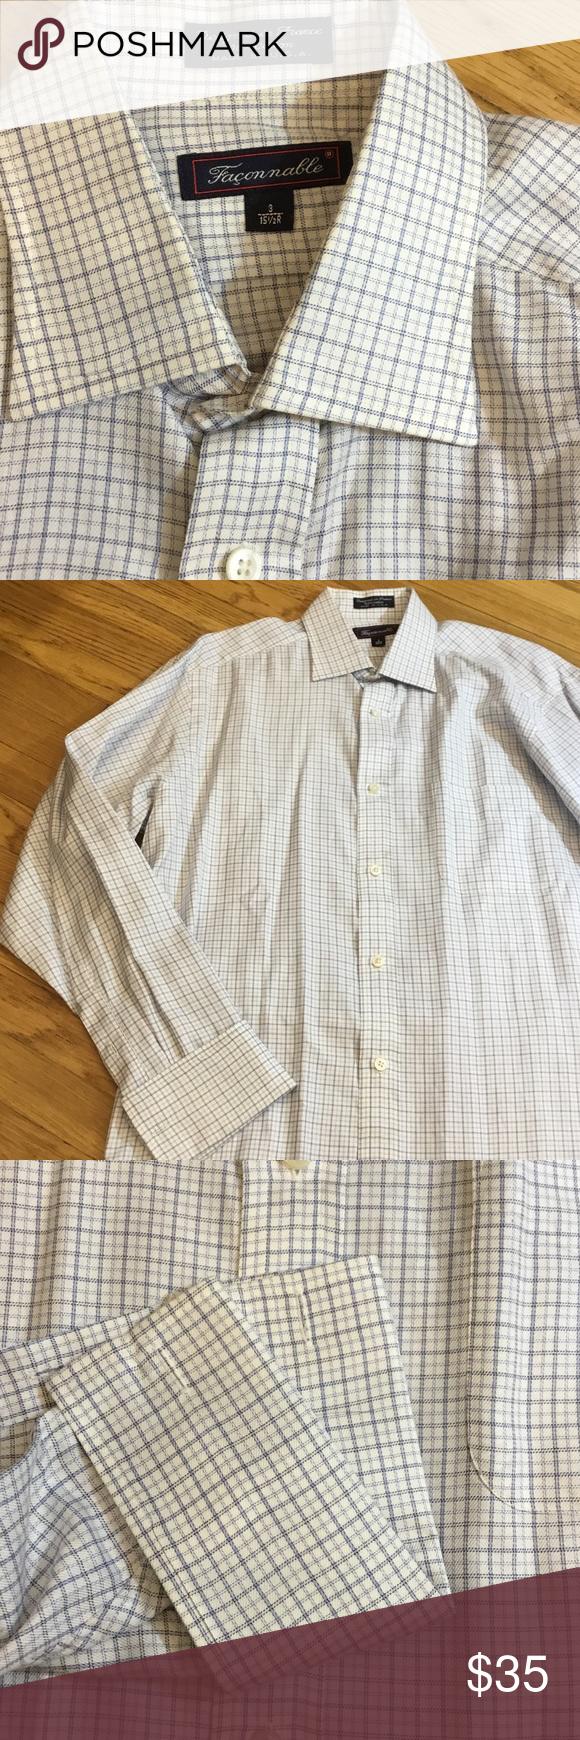 c2bd8ab9aae297 Faconnable mens shirt 15 1 2 r france   Faconnable shirt, Dress ...